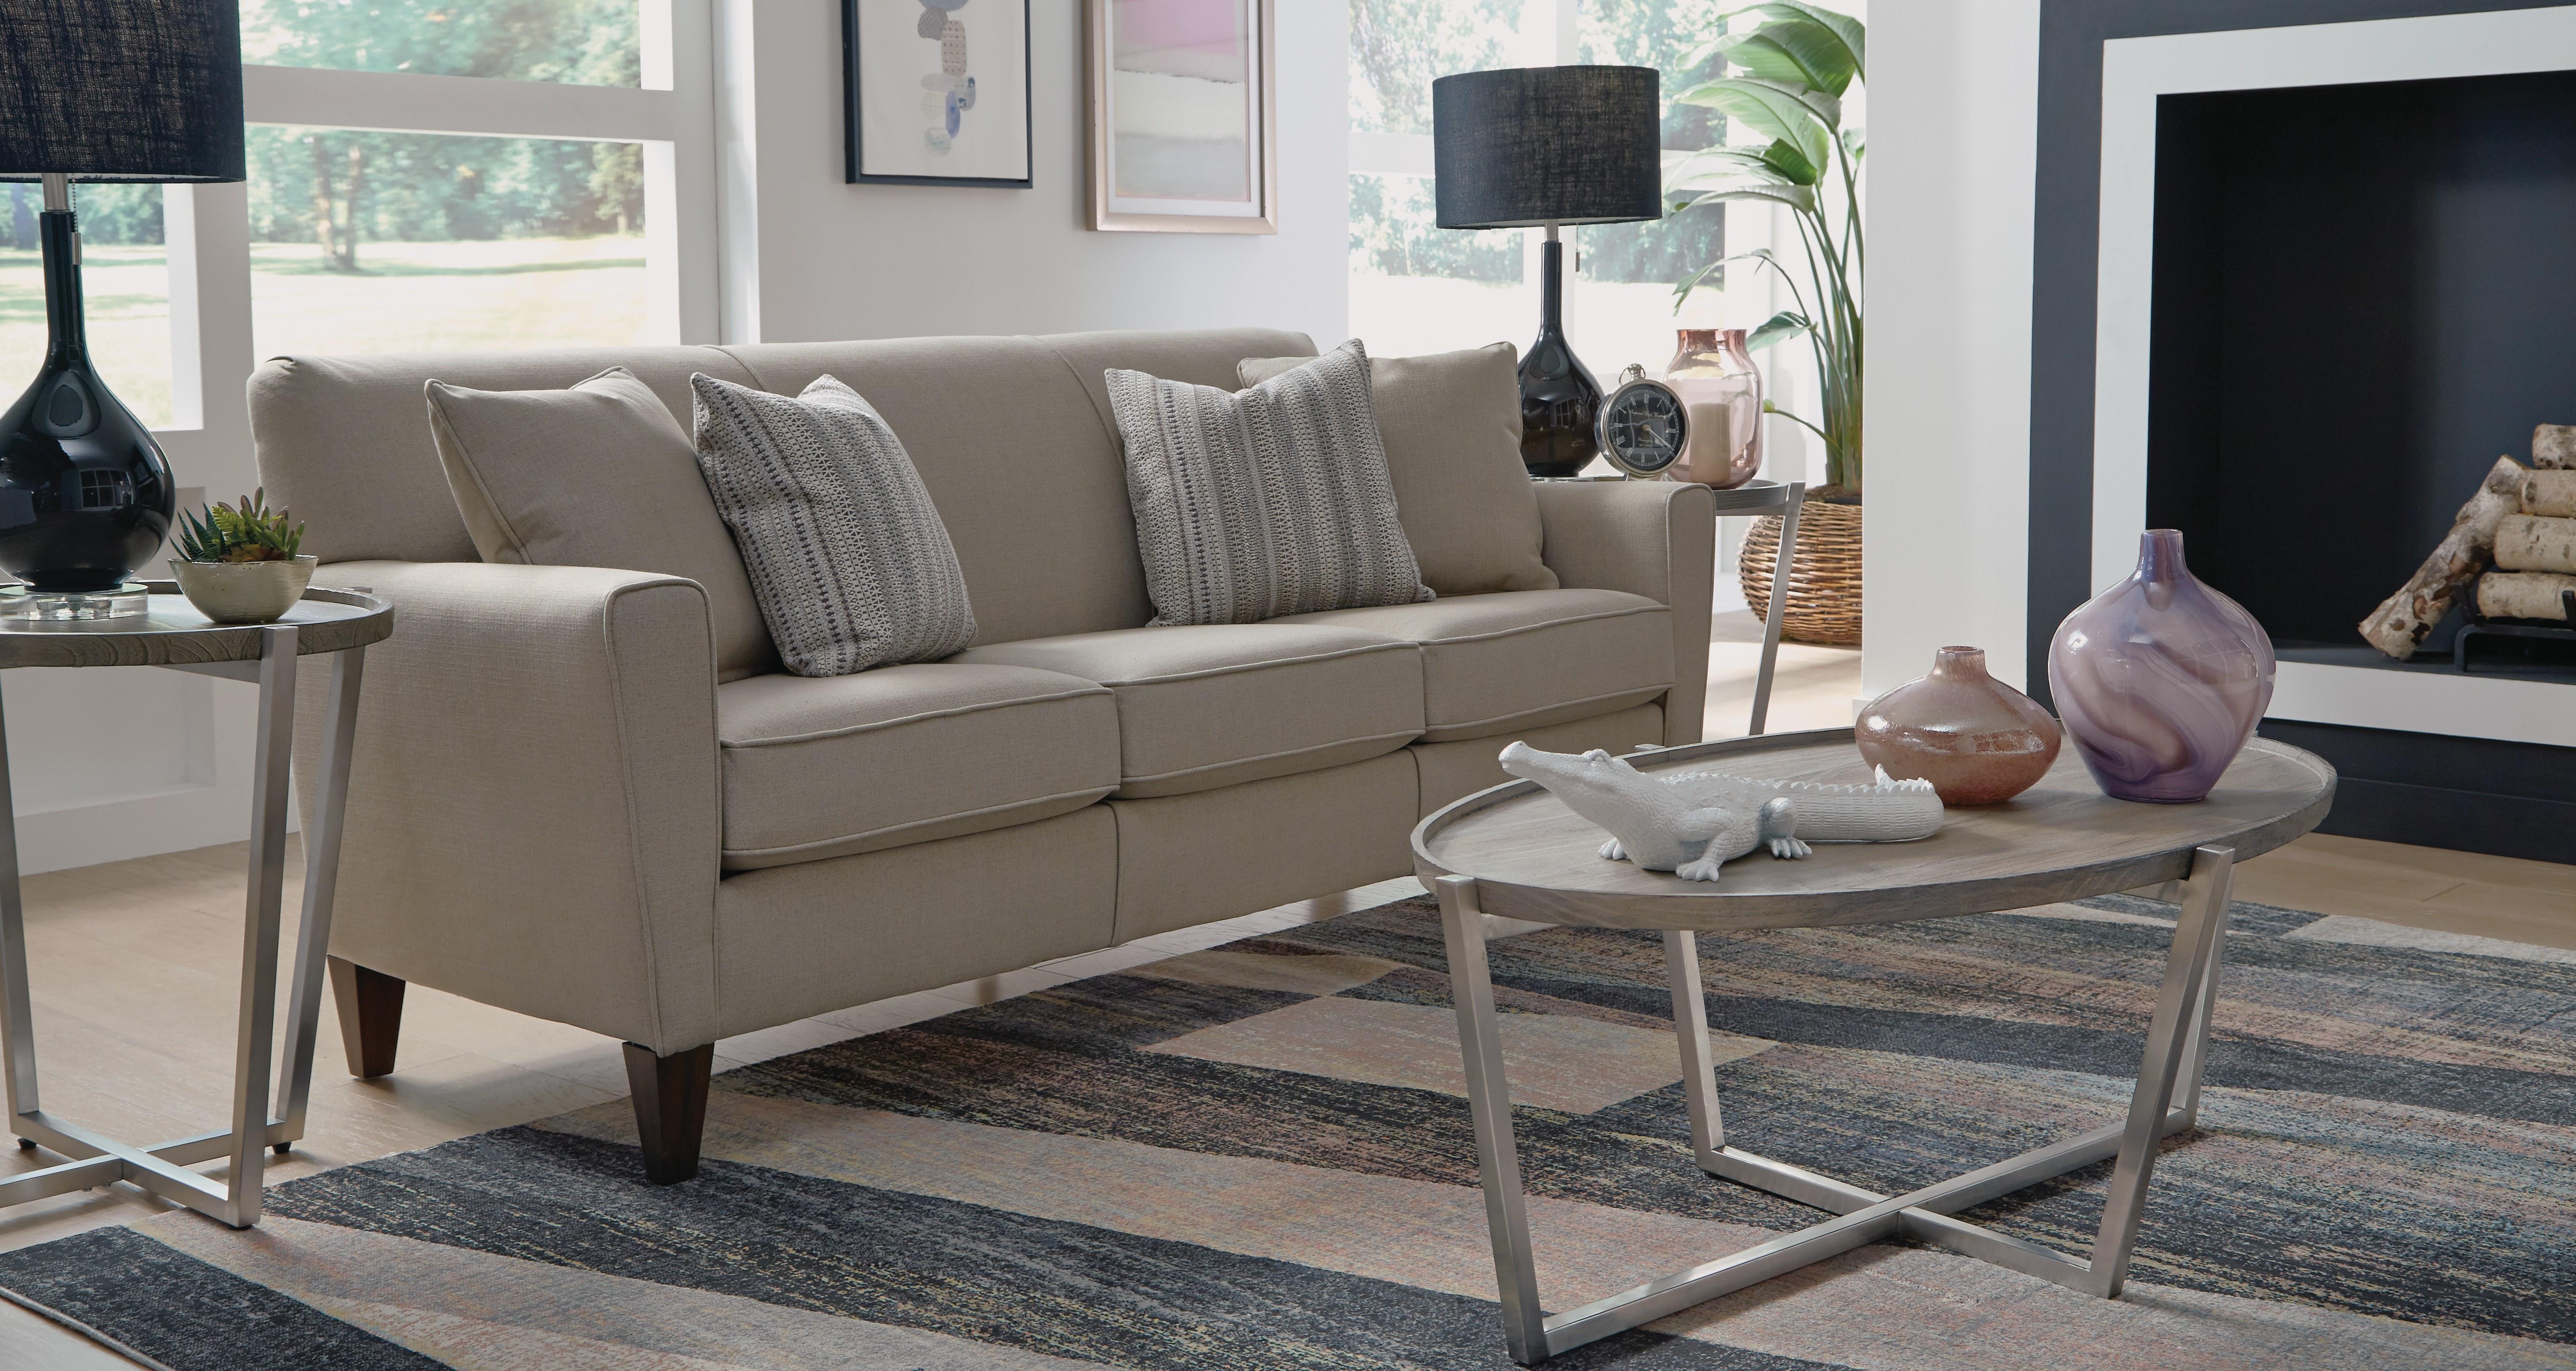 Interior Design Kansas City Area Liberty And Lee S Summit Mo Overland Park Ks Crowley Furniture Mattress